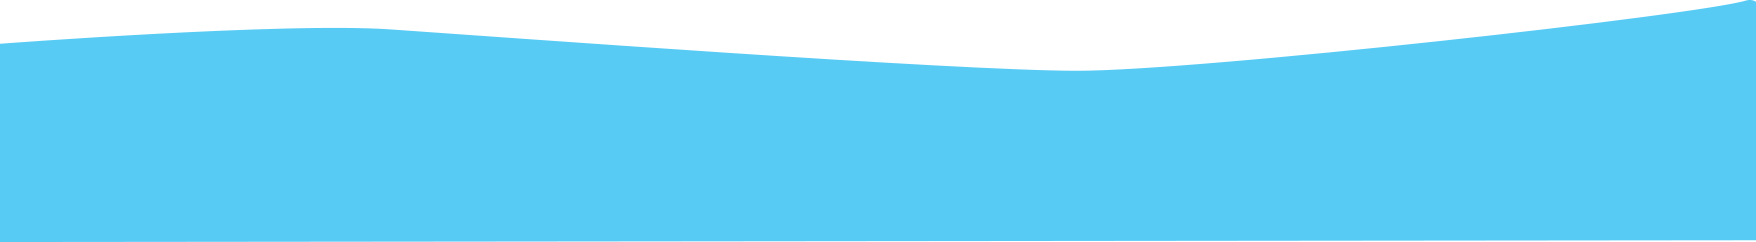 lower blue wave - decoration